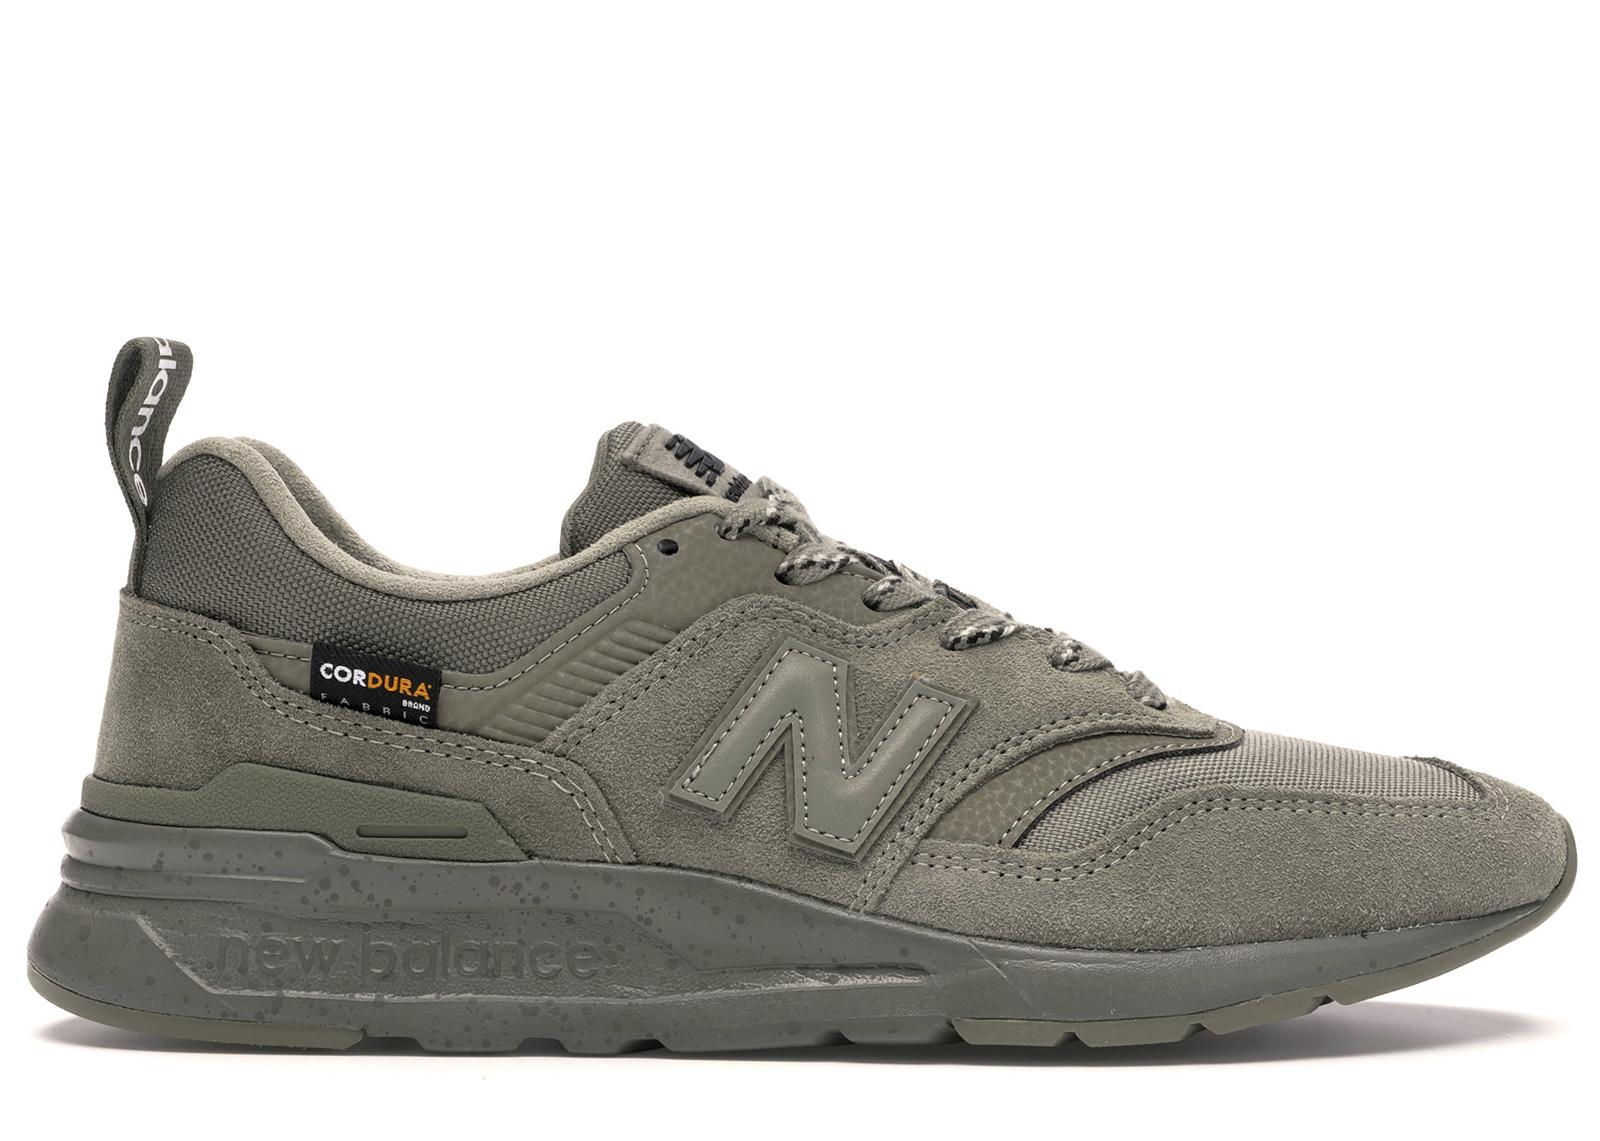 New Balance 997H Cordura Khaki